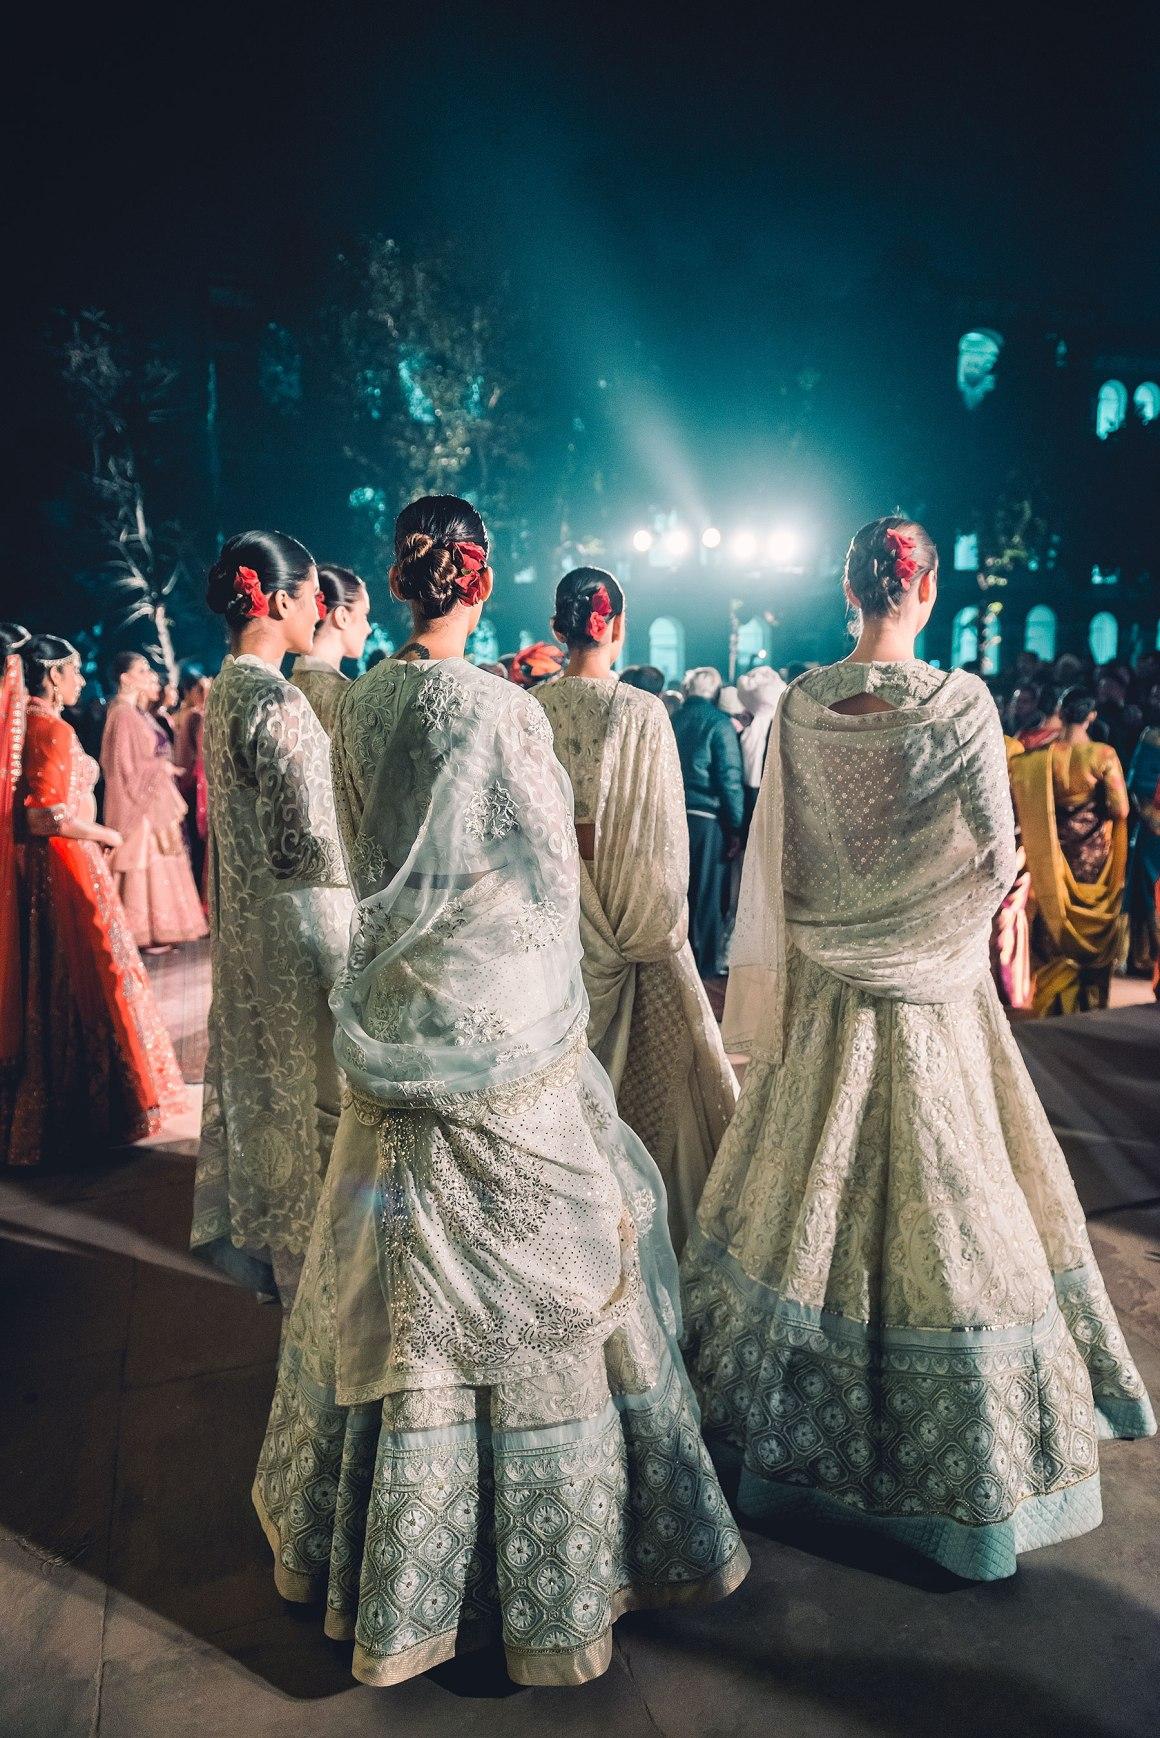 Naina.co, Naina, Naina Redhu, Professional Photographer, Naina Photographer, Rahul Mishra, Fashion Designer, EyesForFashion, MadeInIndia, Ministry of Textiles, Red Fort, Lal Quila, Lal Qila, Runway, Heritage Building, Fashion Design Council of India, FDCI, Ministry of Culture, Archaeological Survey of India, Indian Textiles, Indian Fabric, Indian Weavers, Chikankari, White, Off White, Pastel, Indian Wear, Photo Blogger, Lifestyle Blogger, Lifestyle Photographer, Fashion Photographer, New Delhi